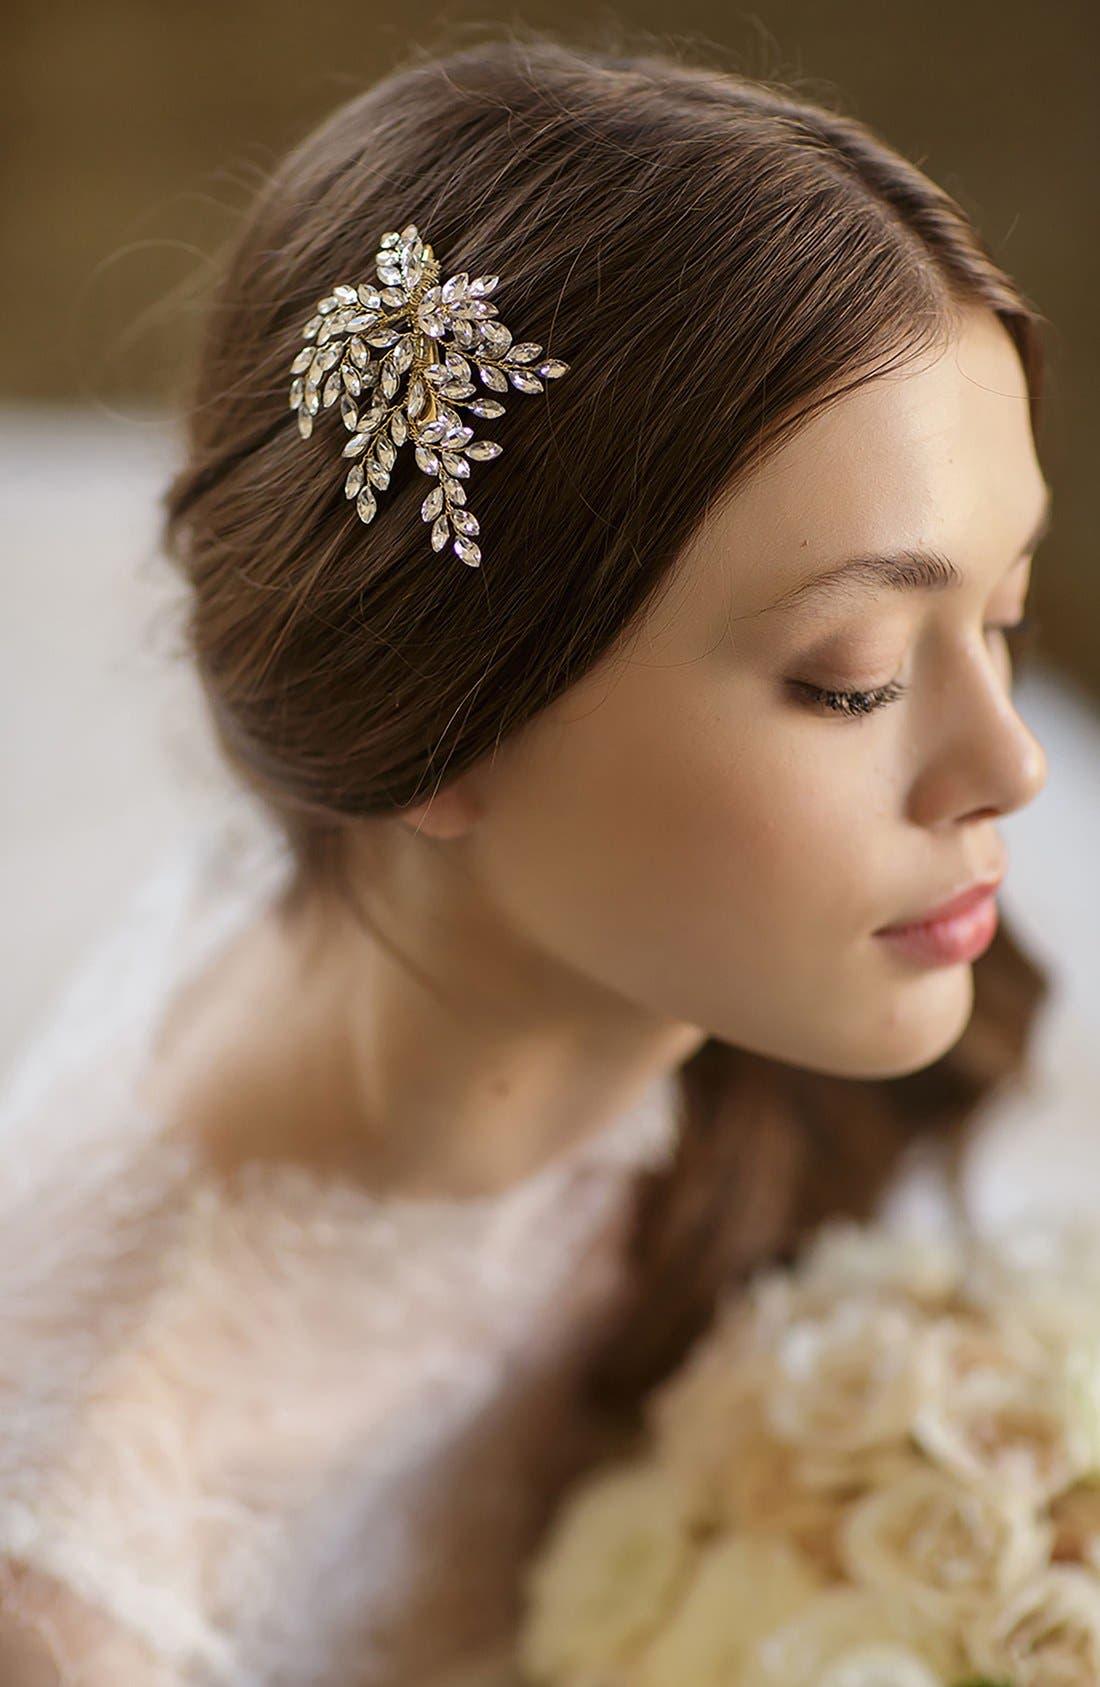 BRIDES & HAIRPINS Sahara Crystal Leaf Bendable Hair Clip